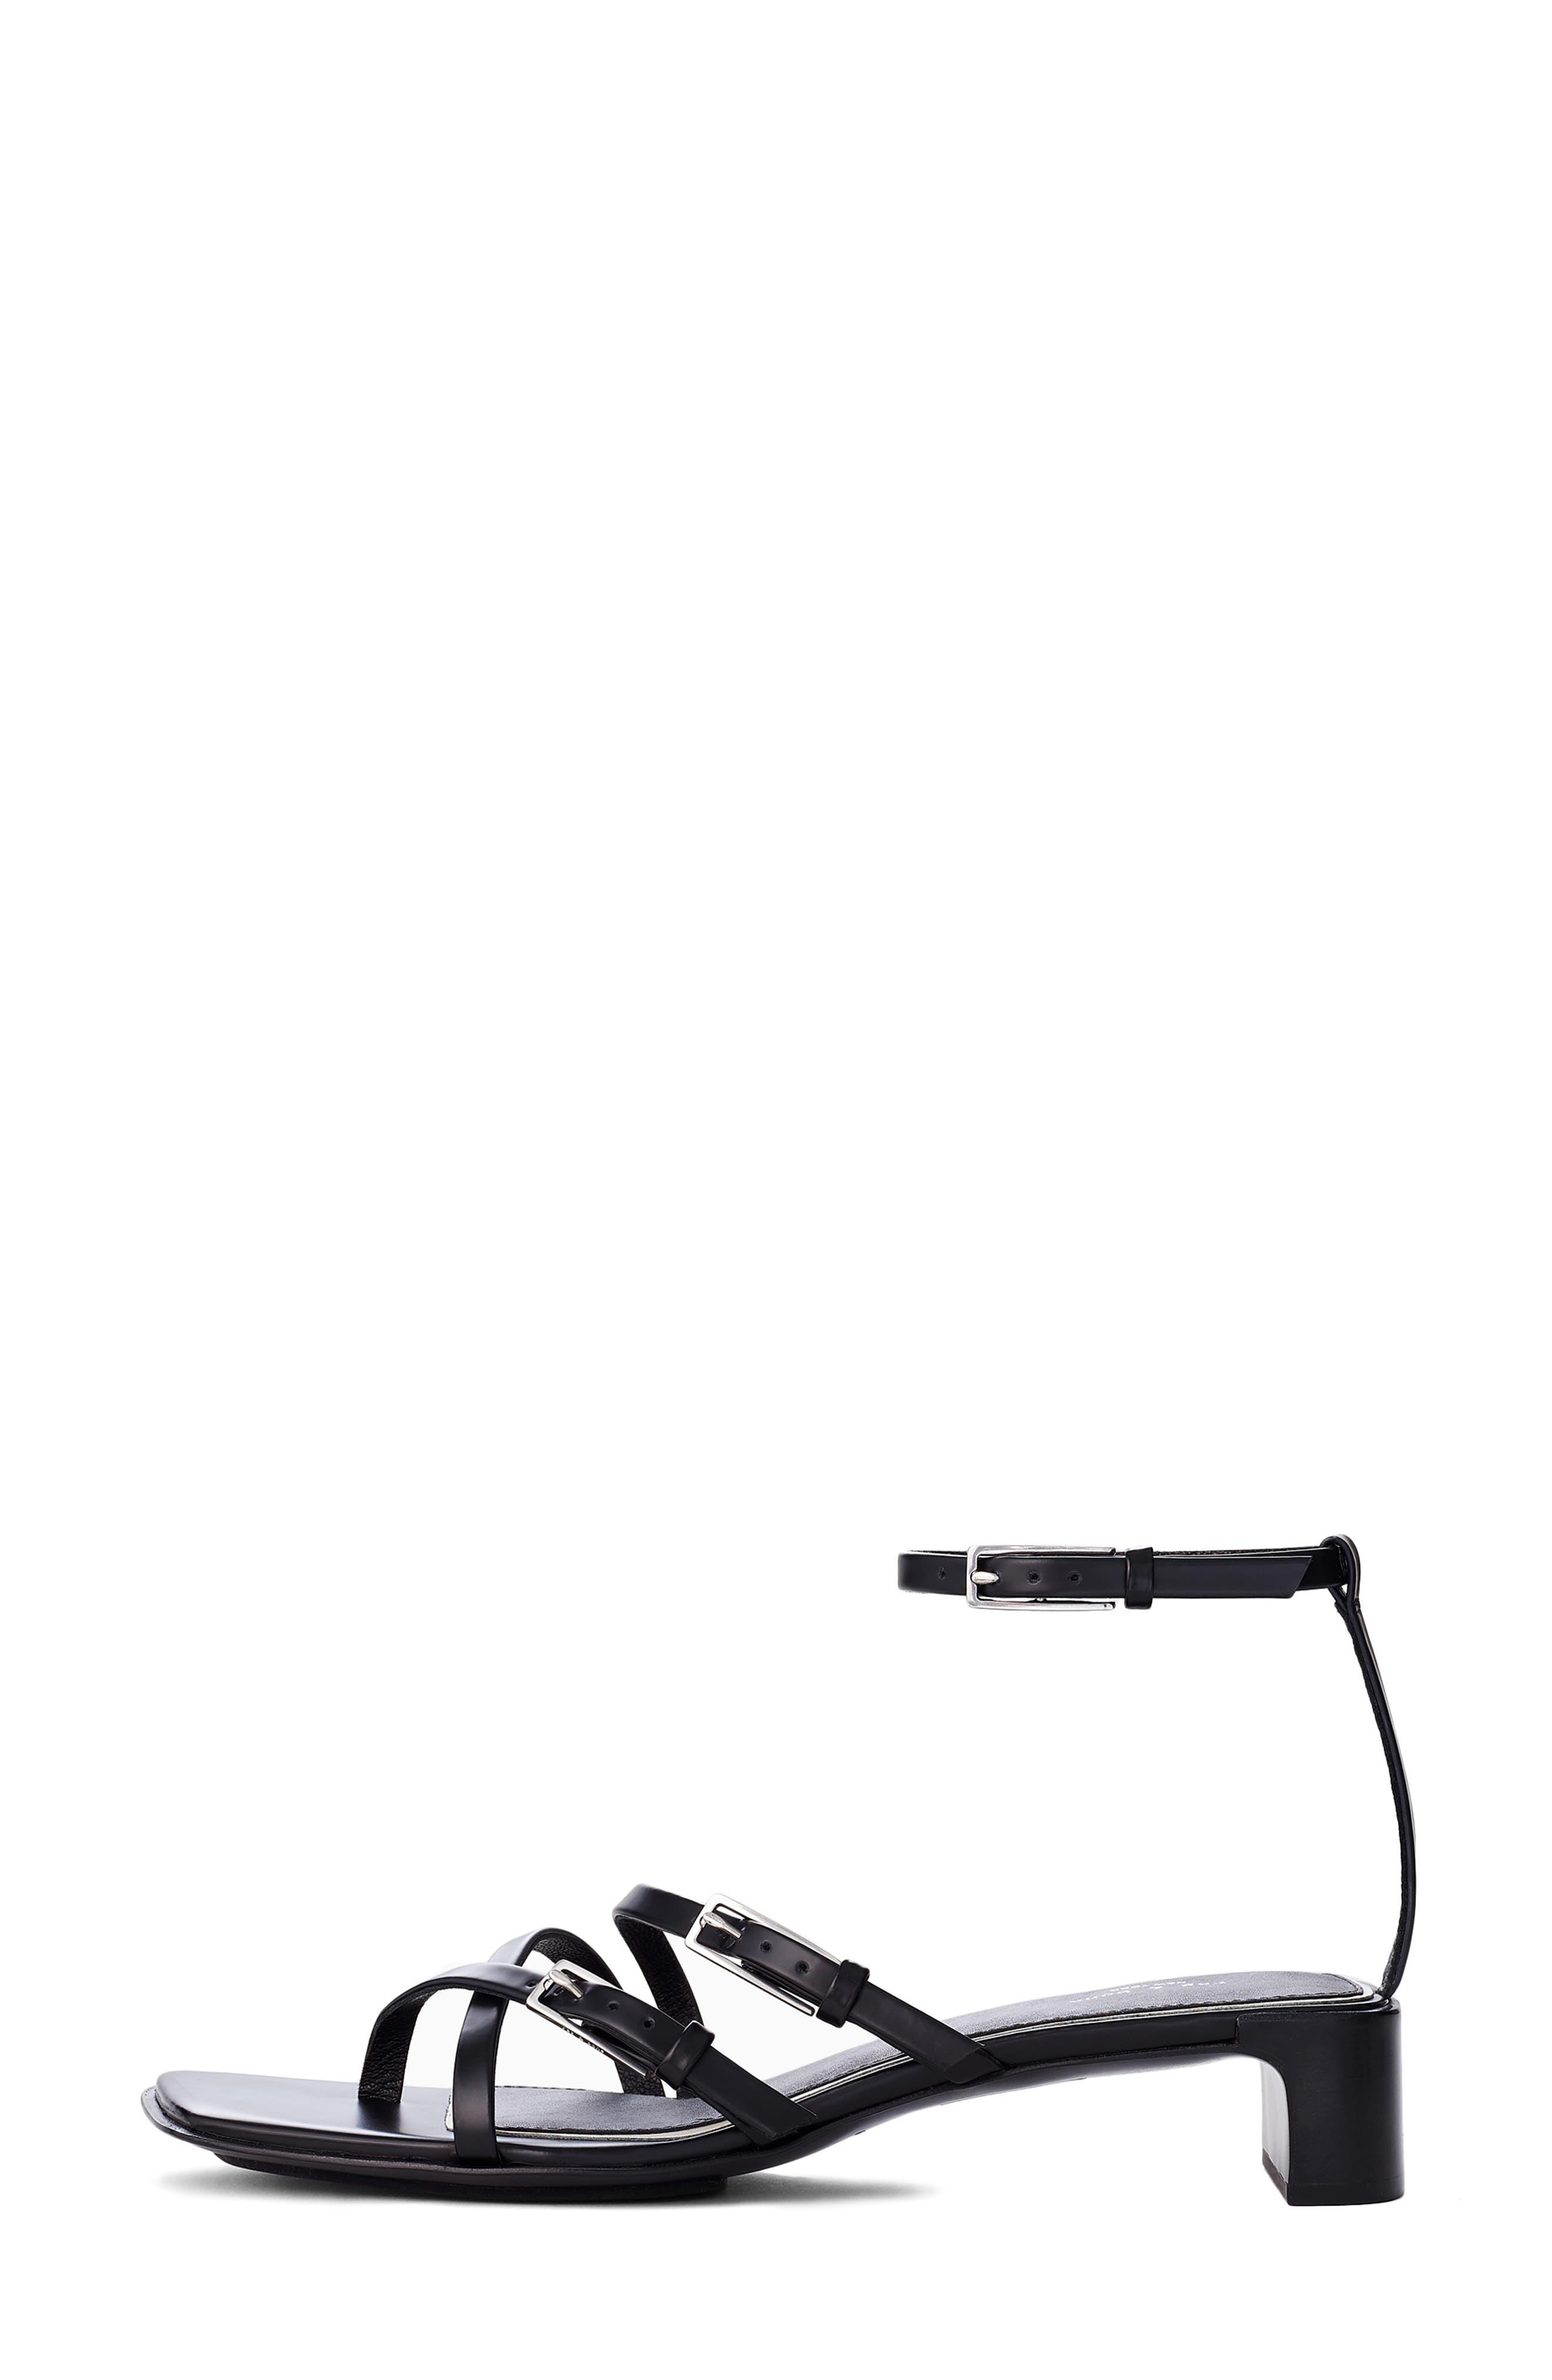 Image of Rag & Bone Calliope Ankle Strap Sandal